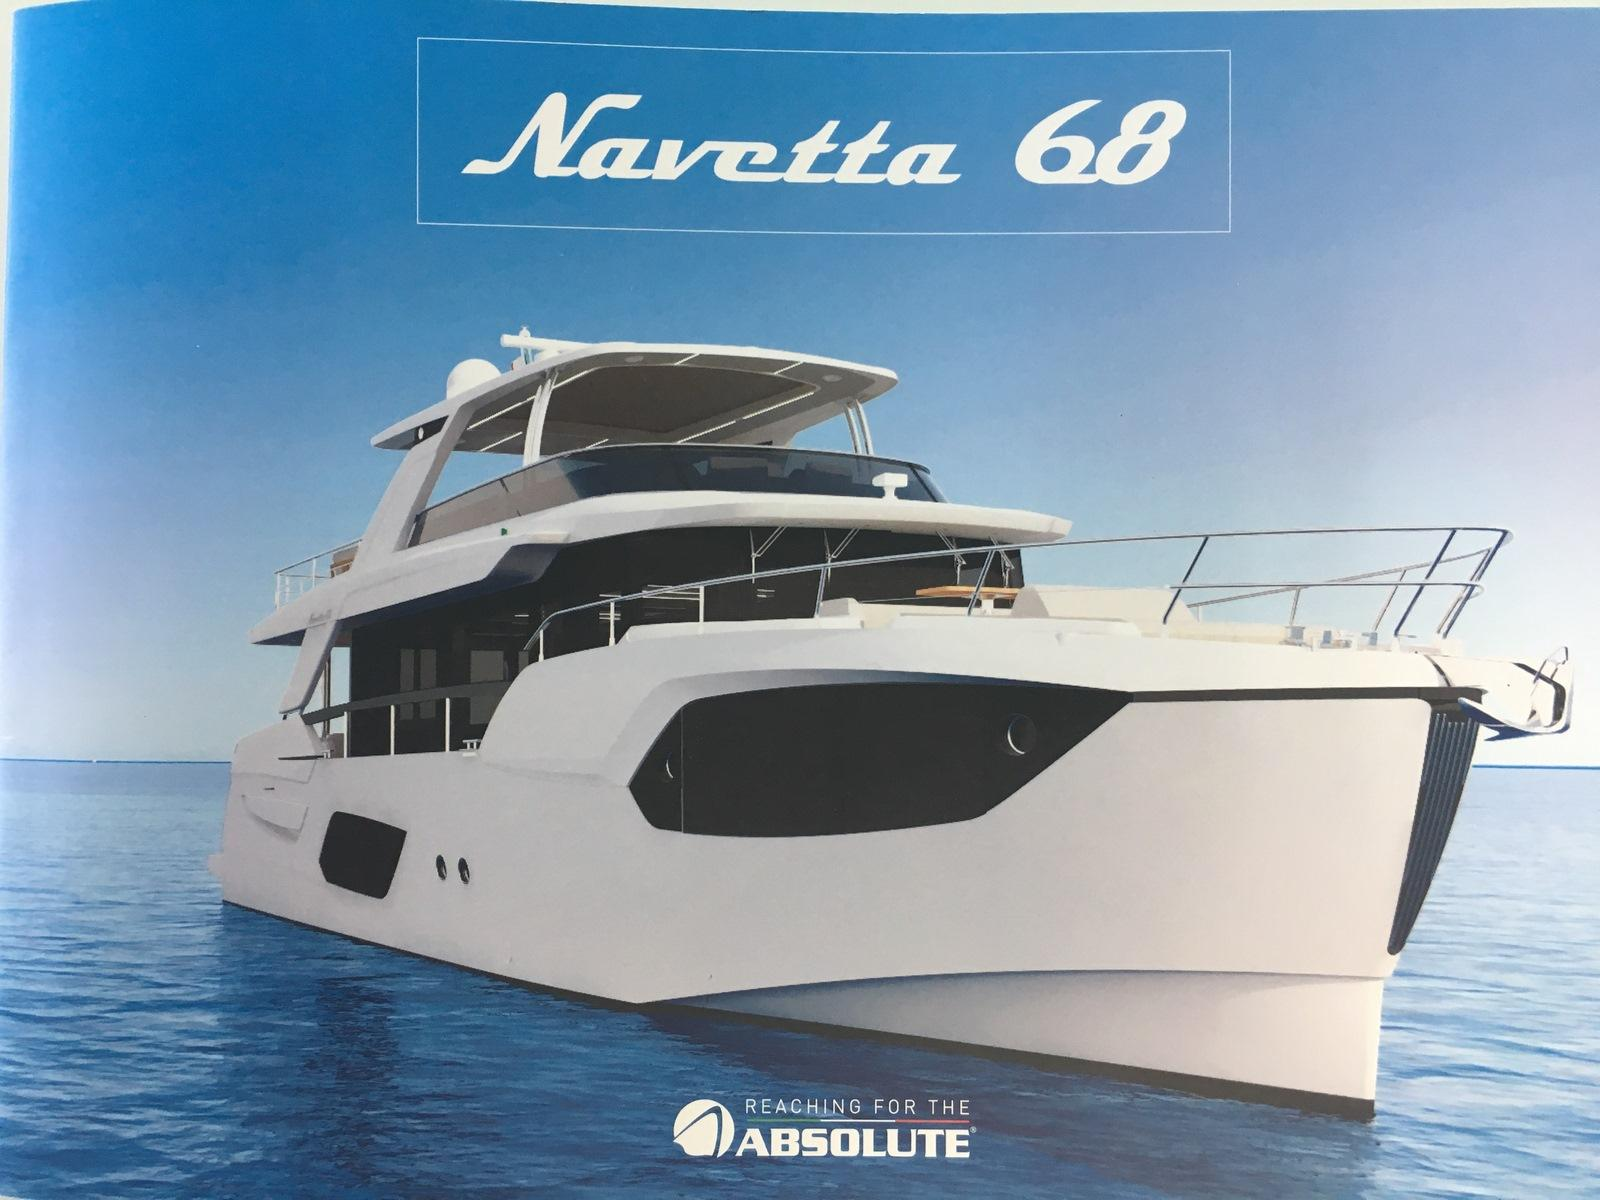 ABSOLUTE NAVETTA 68